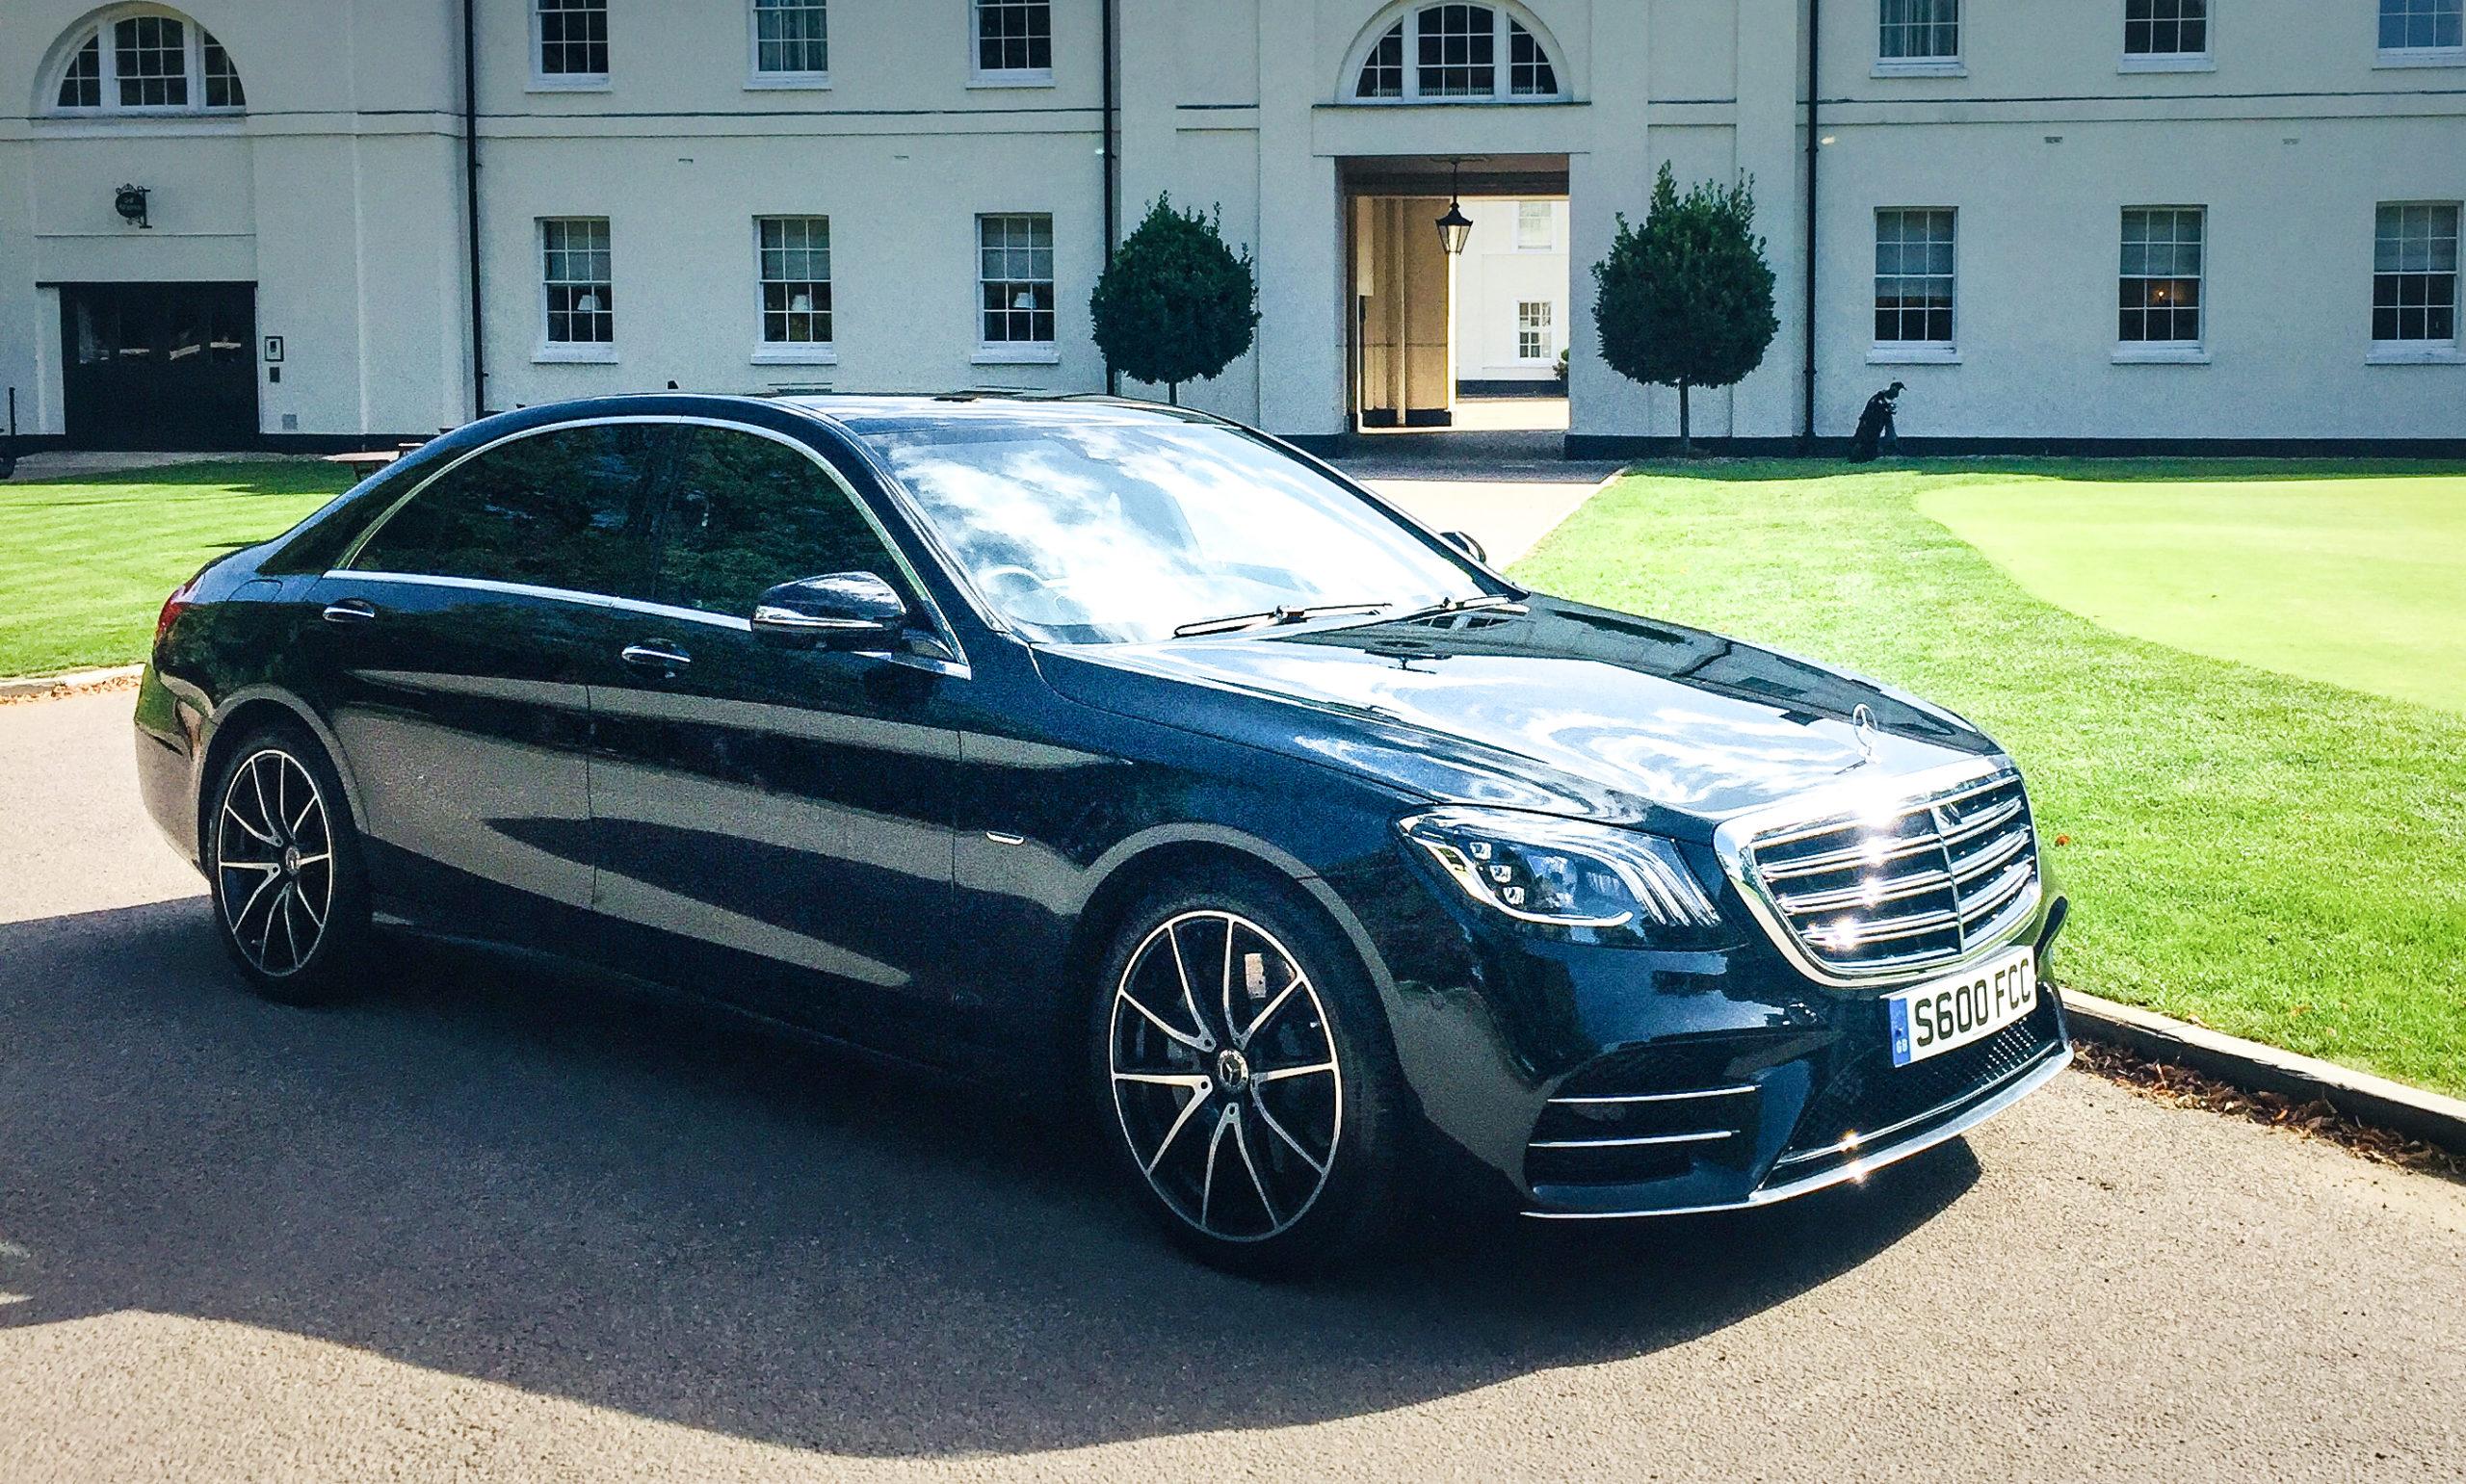 Mercedes S Class, A First Class Cars Chauffeur vehicle